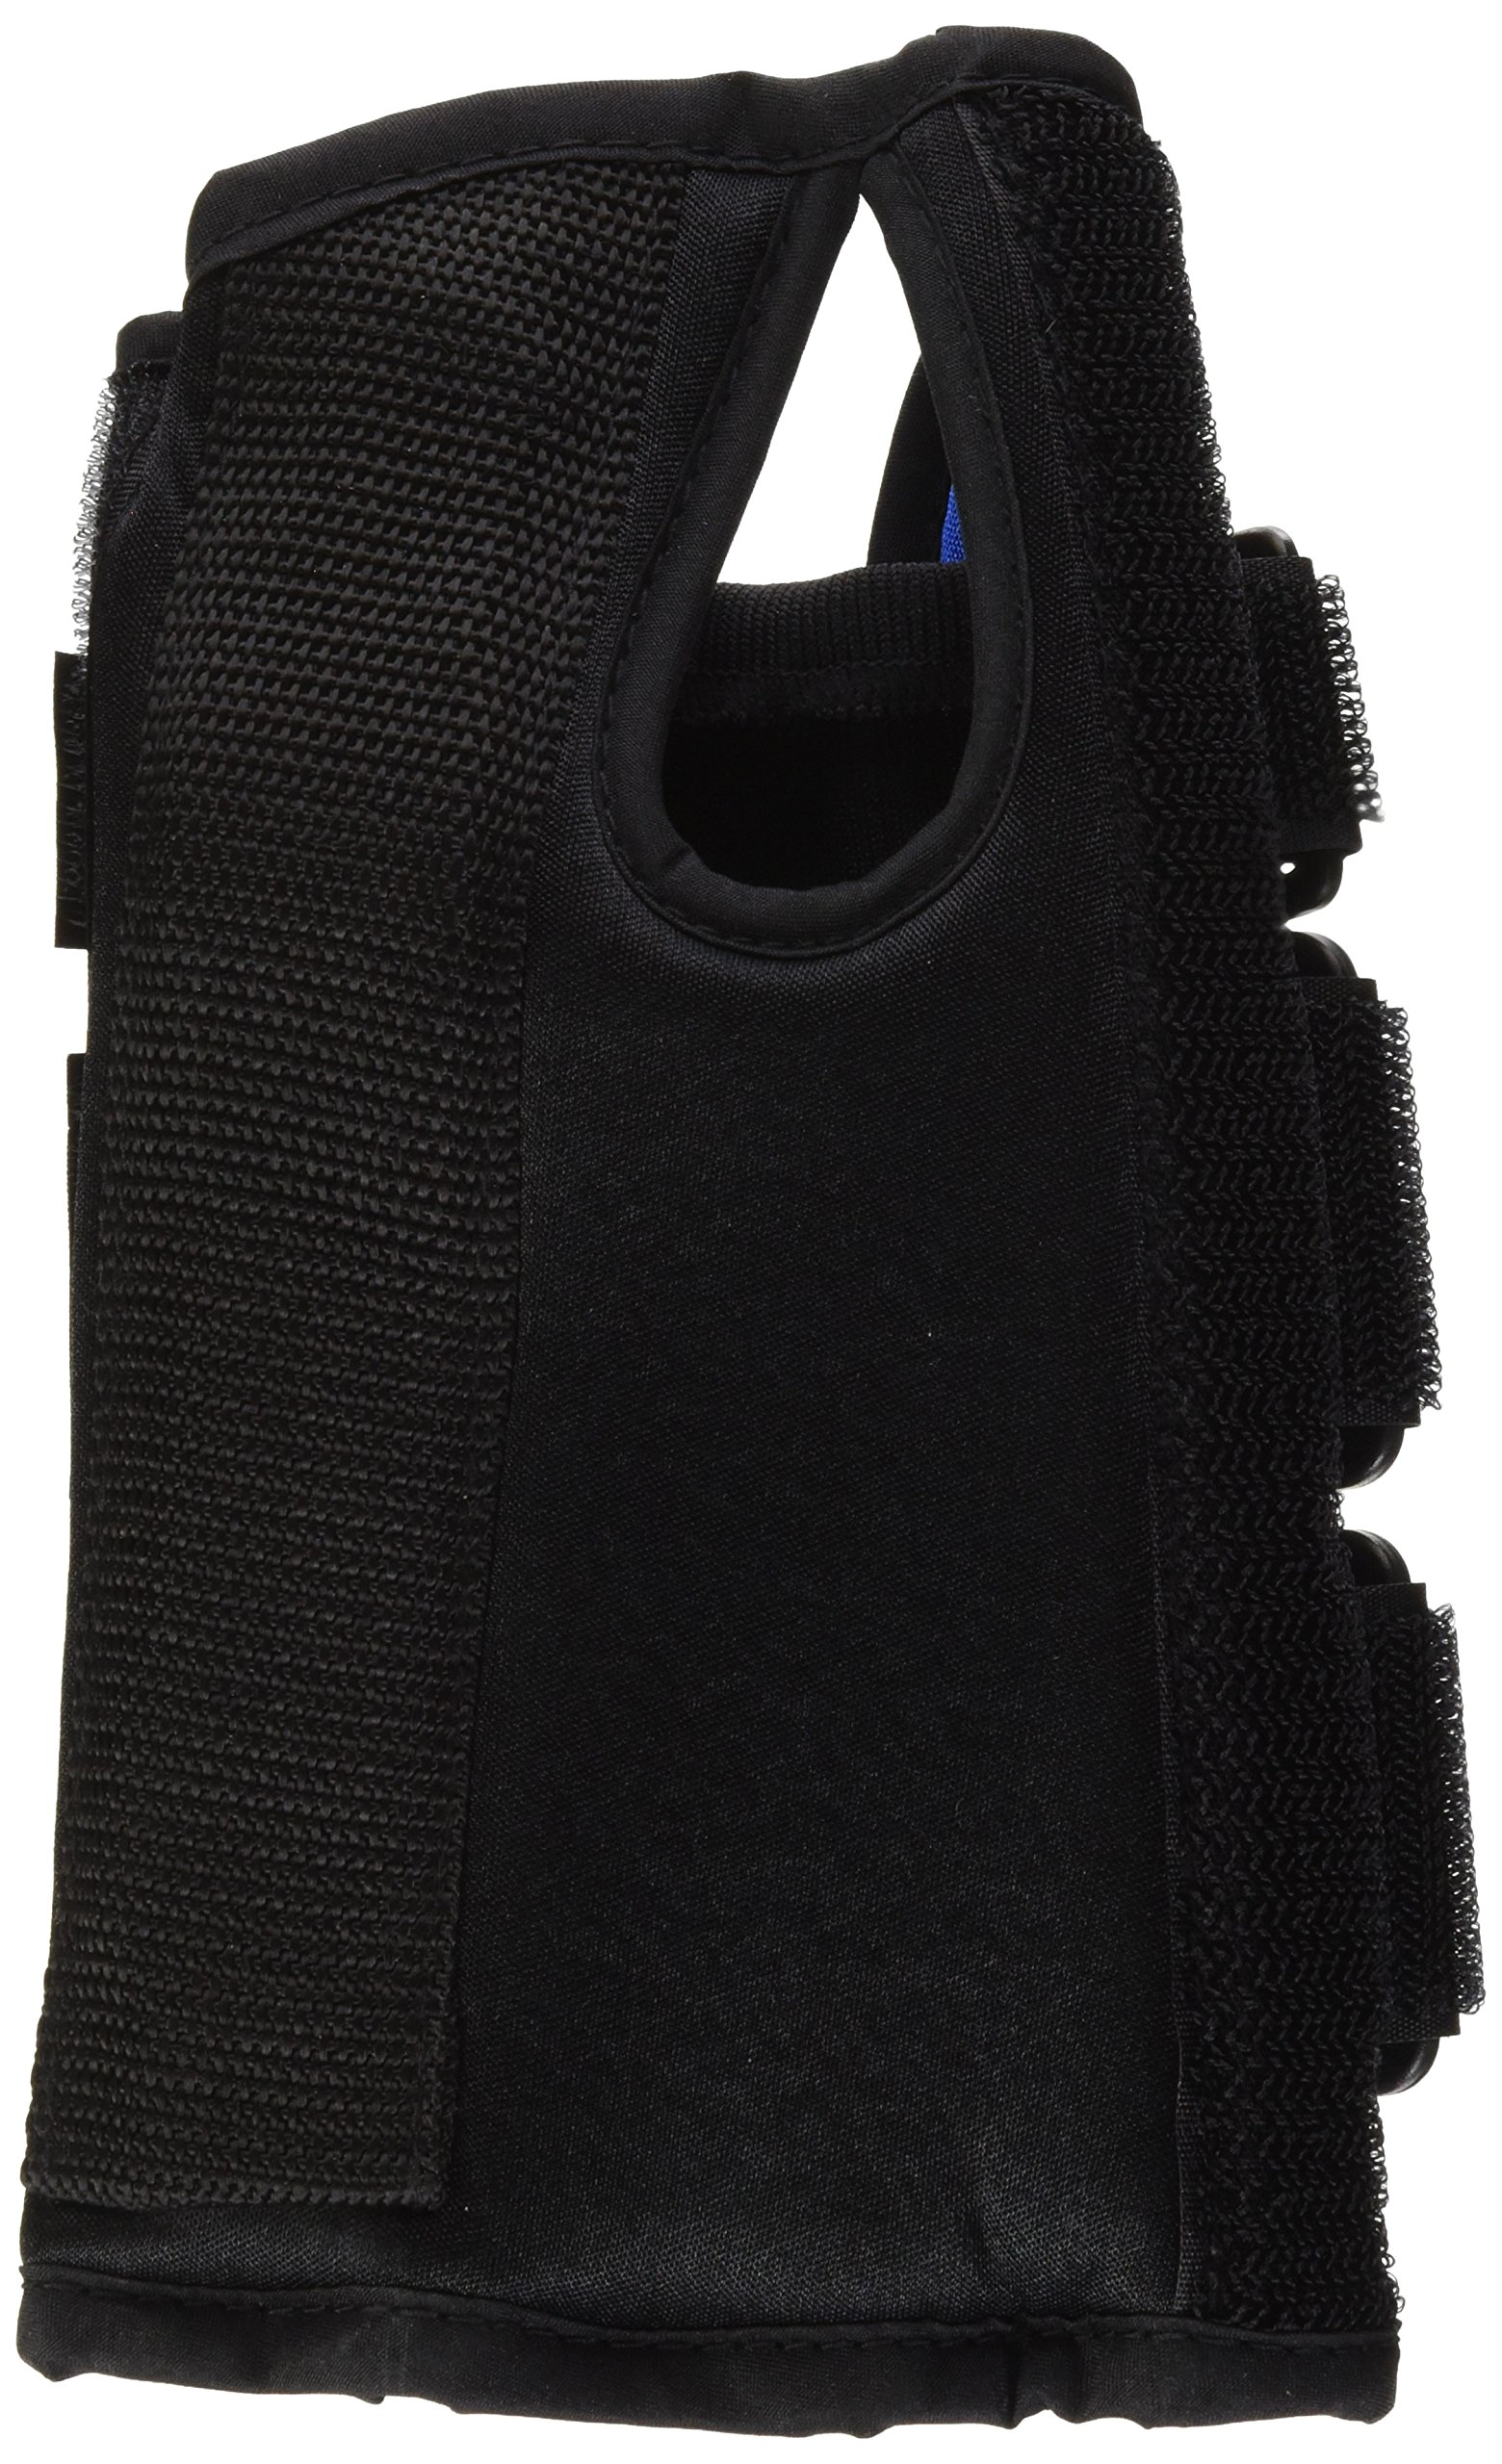 Bilt-Rite Mastex Health 8 Inch Premium Right Wrist Brace, Black, Small